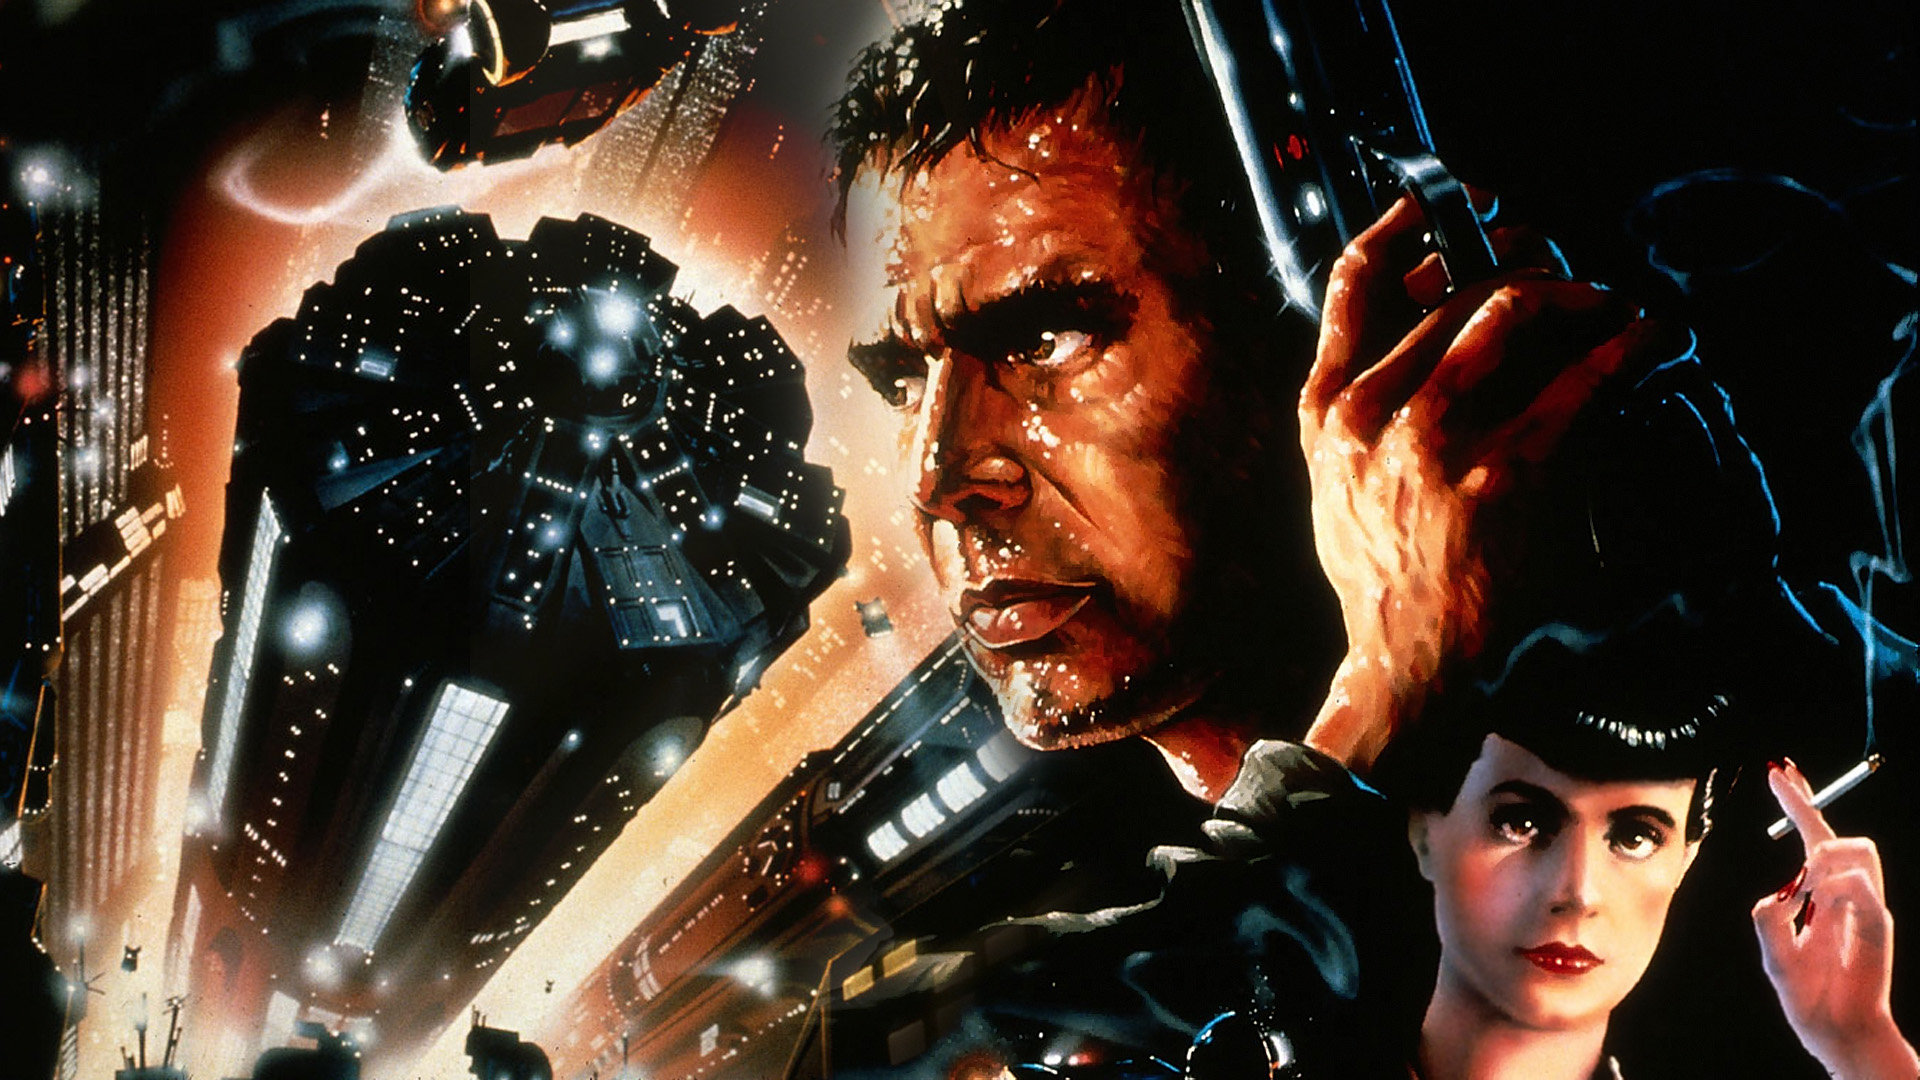 Blade Runner HD Wallpaper   Background Image   1920x1080 ...